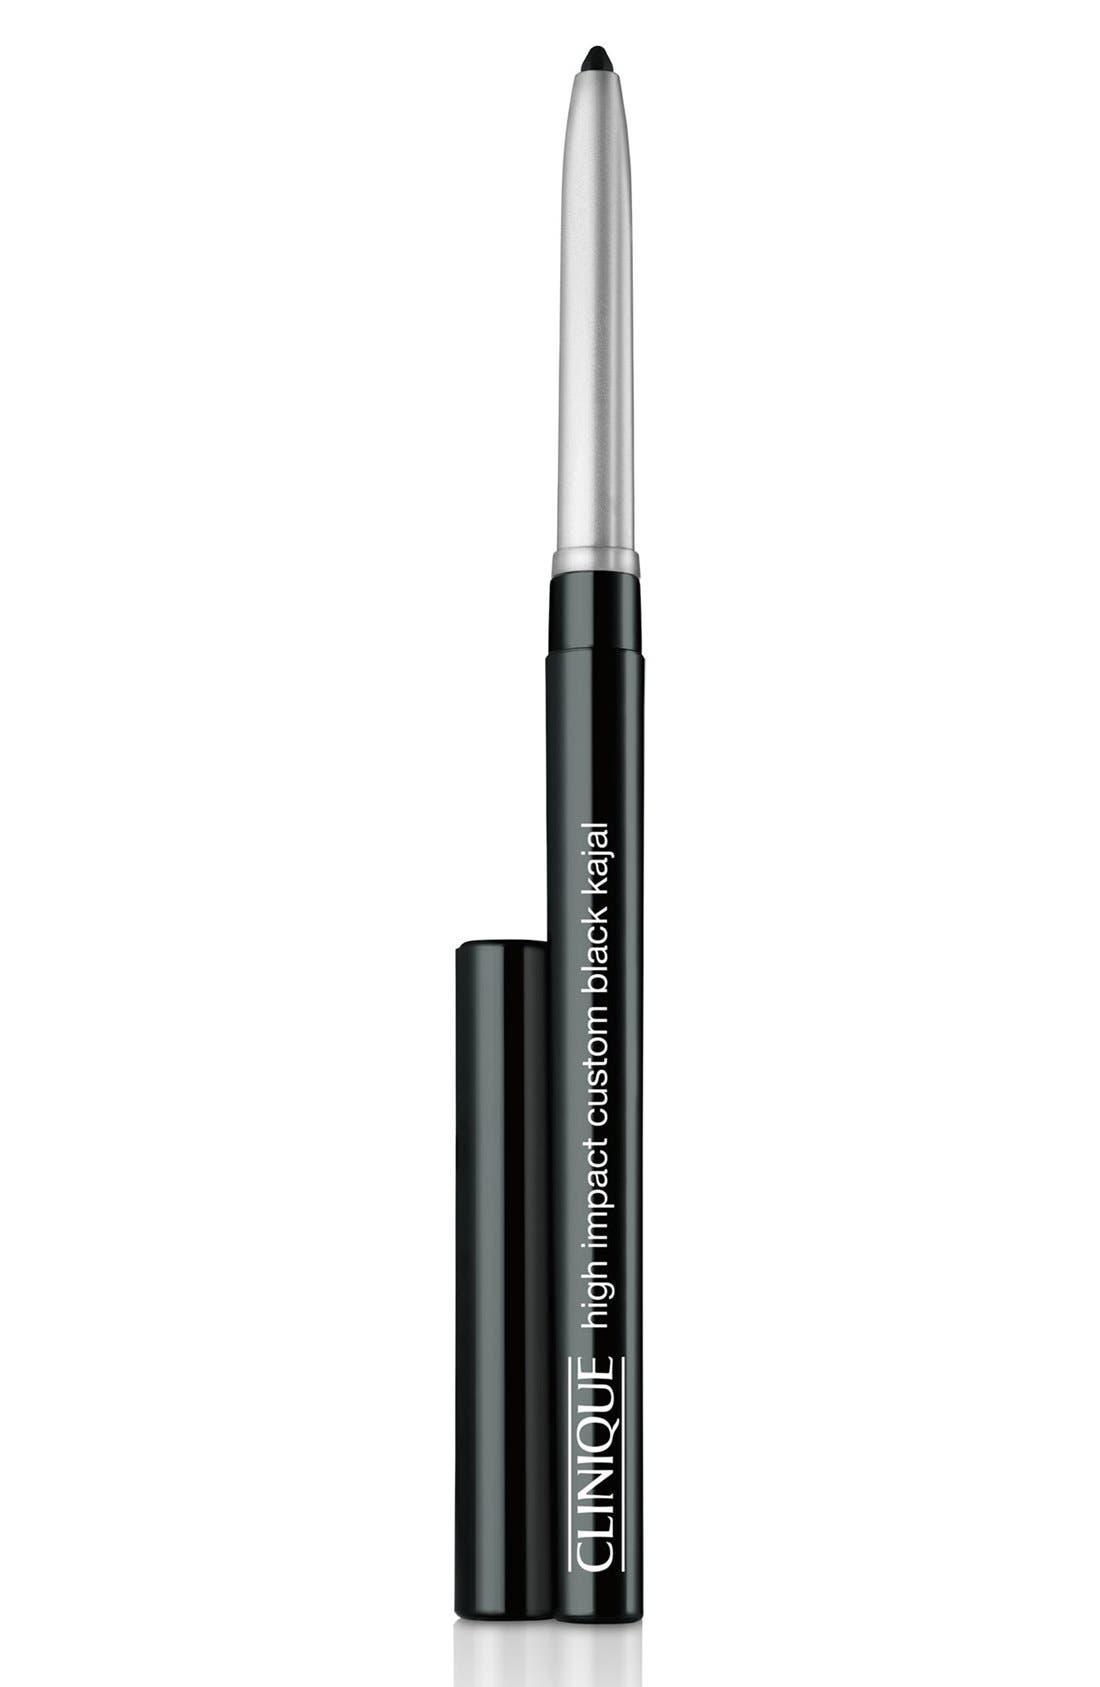 Clinique High Impact Custom Black Kajal Eyeliner Pencil